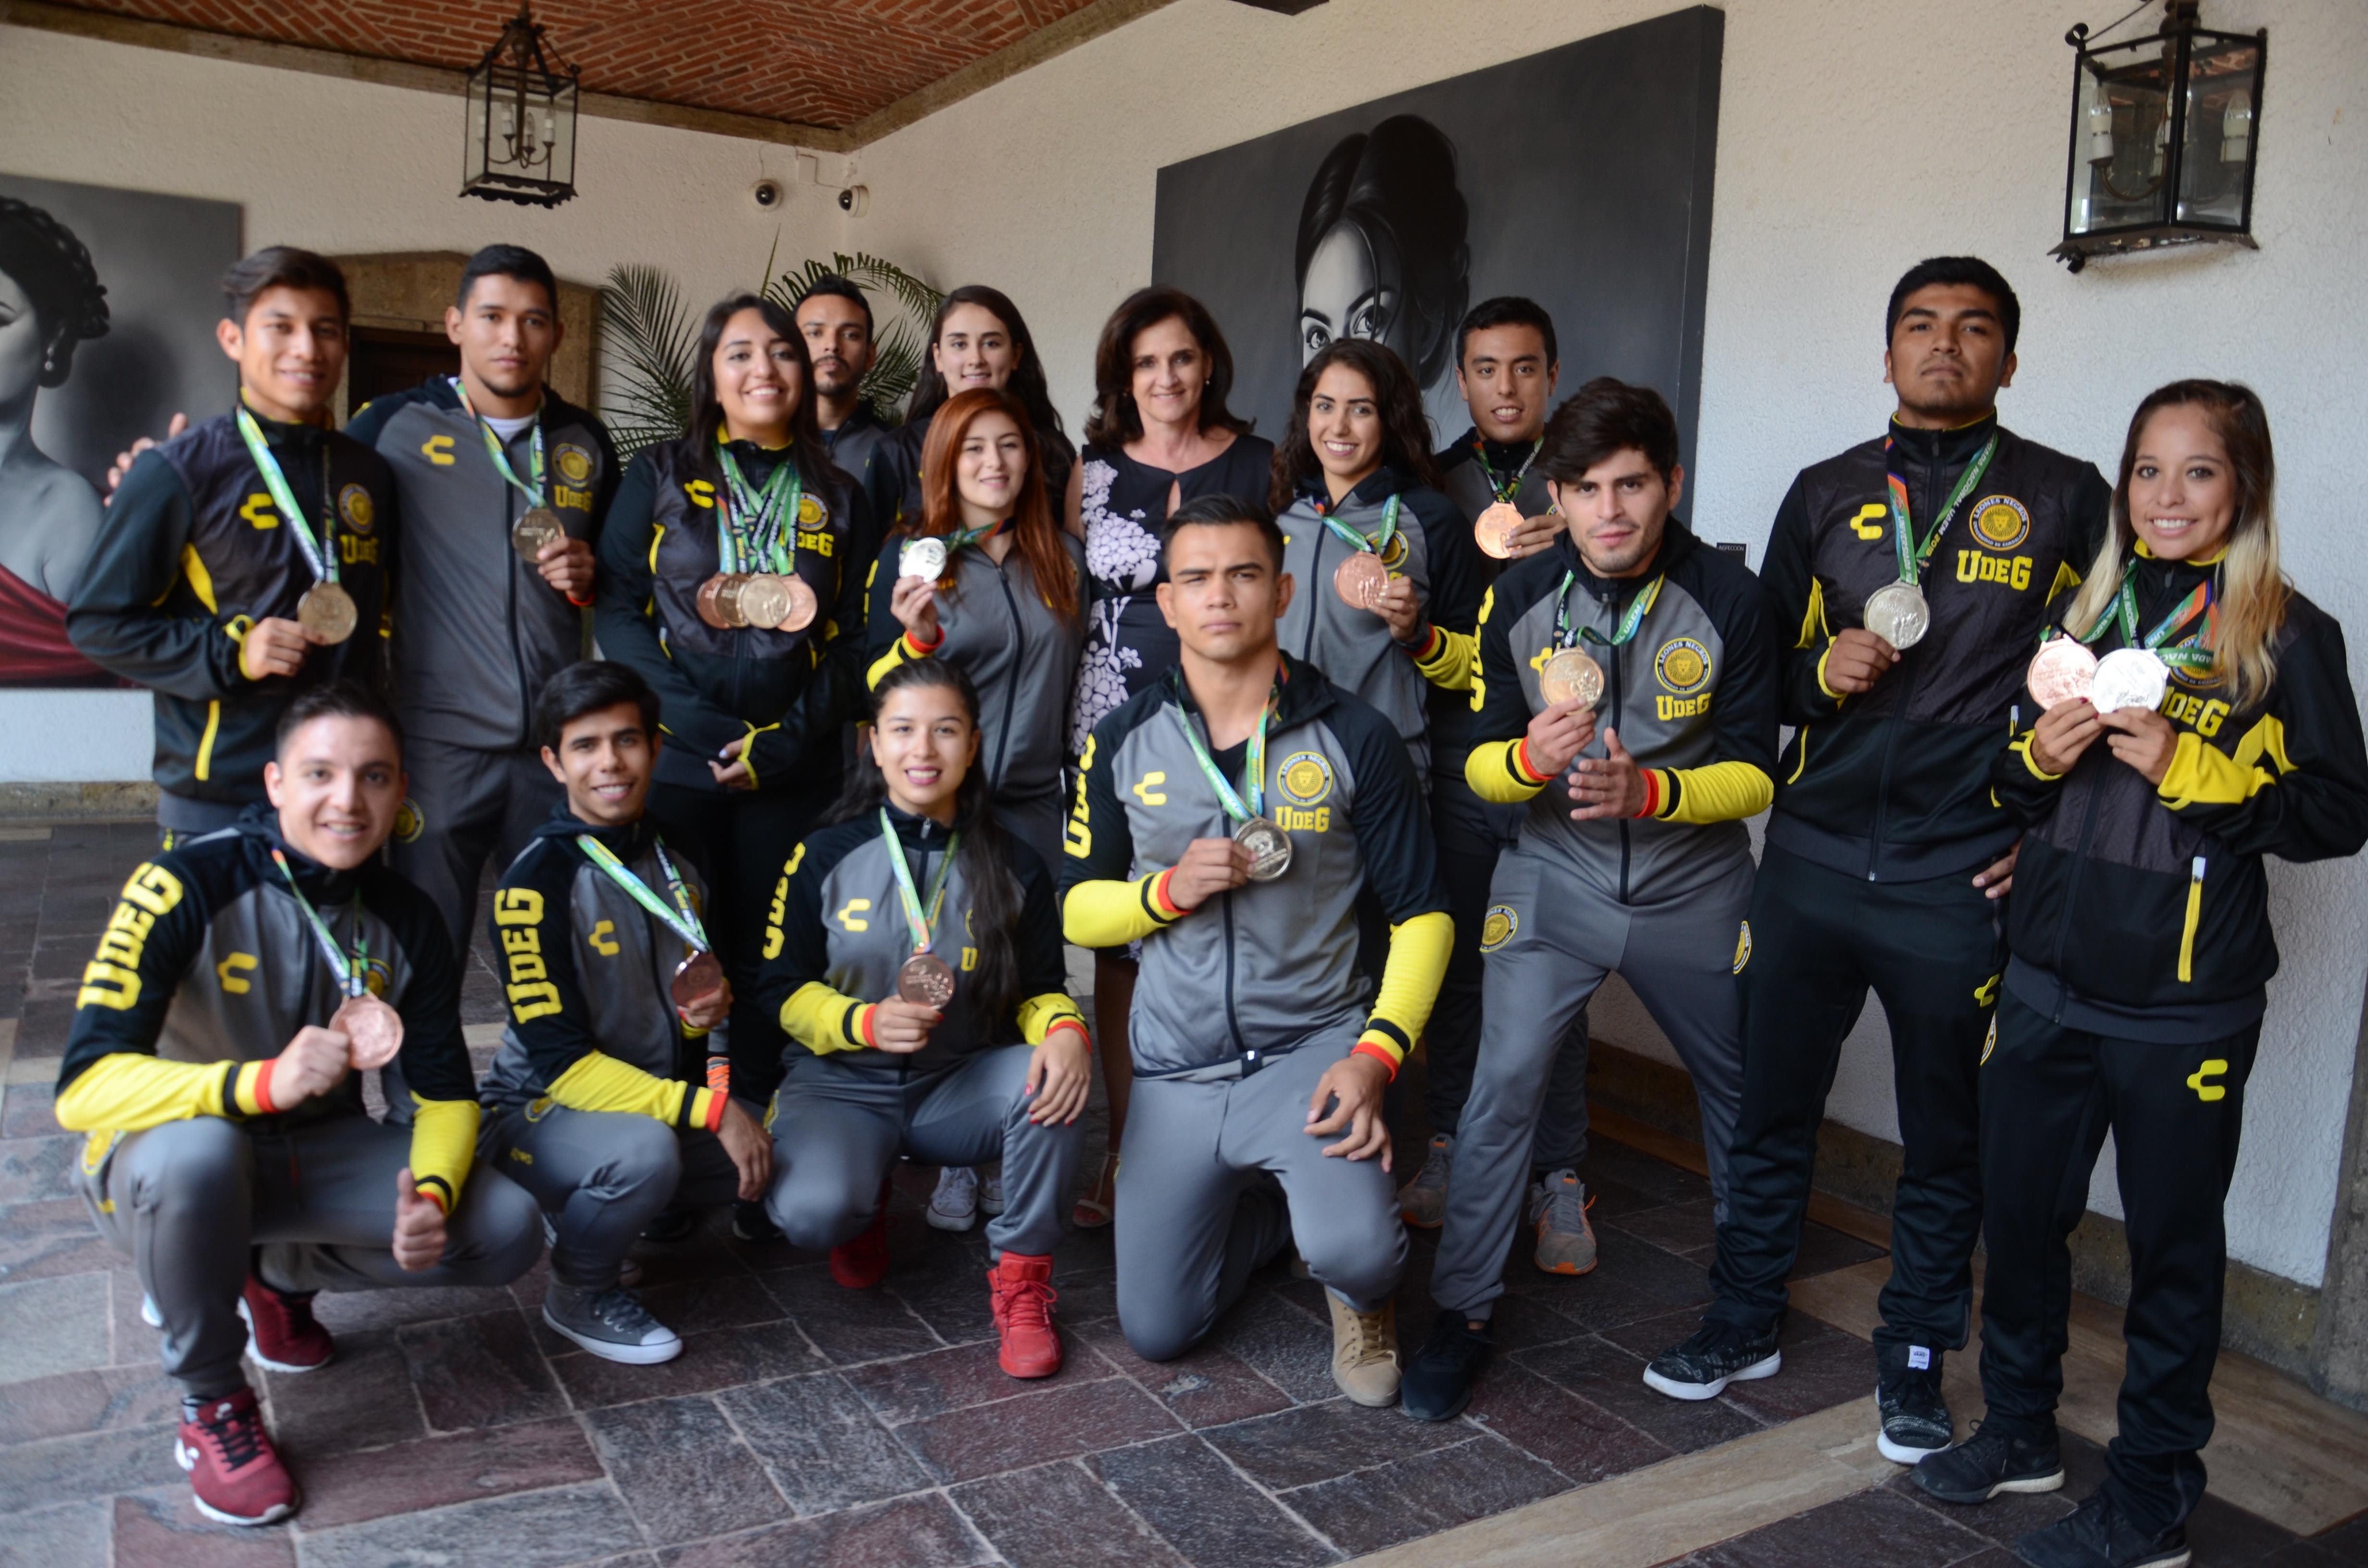 Foto grupal solo medallistas del CUCS